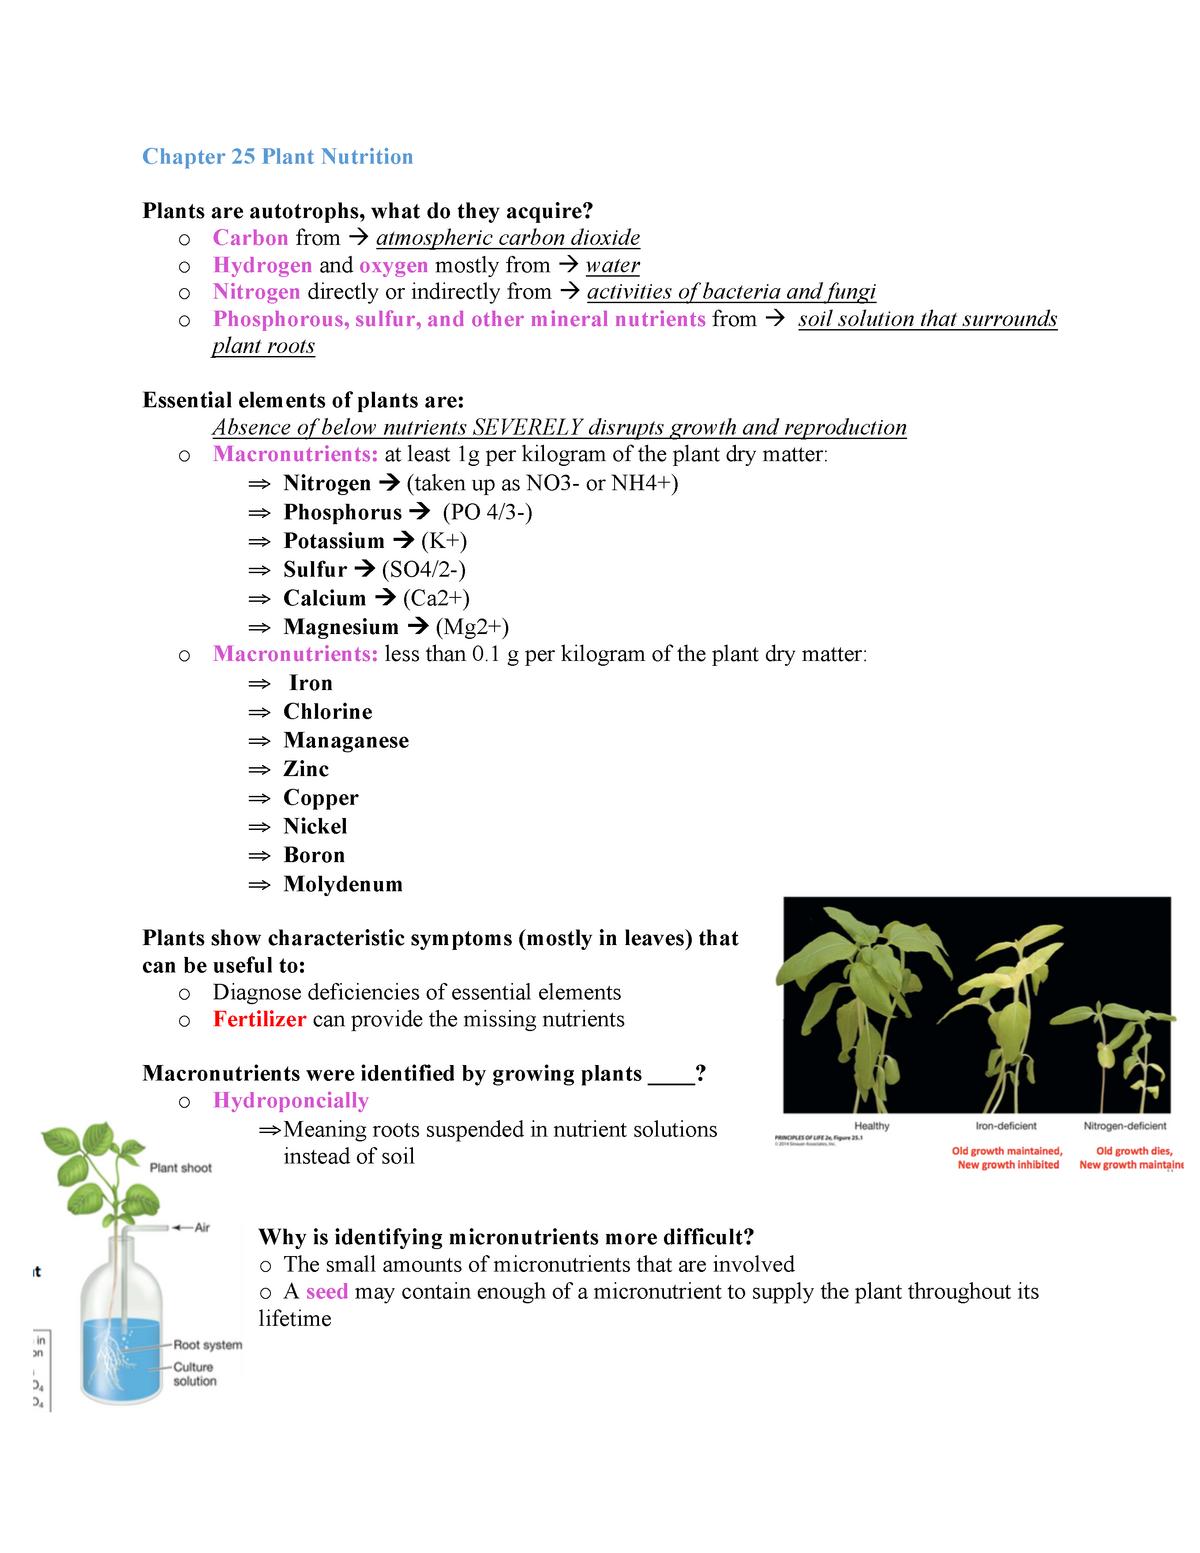 Chapter 25 Plant Nutrition From The Anatomy Prospective Studocu